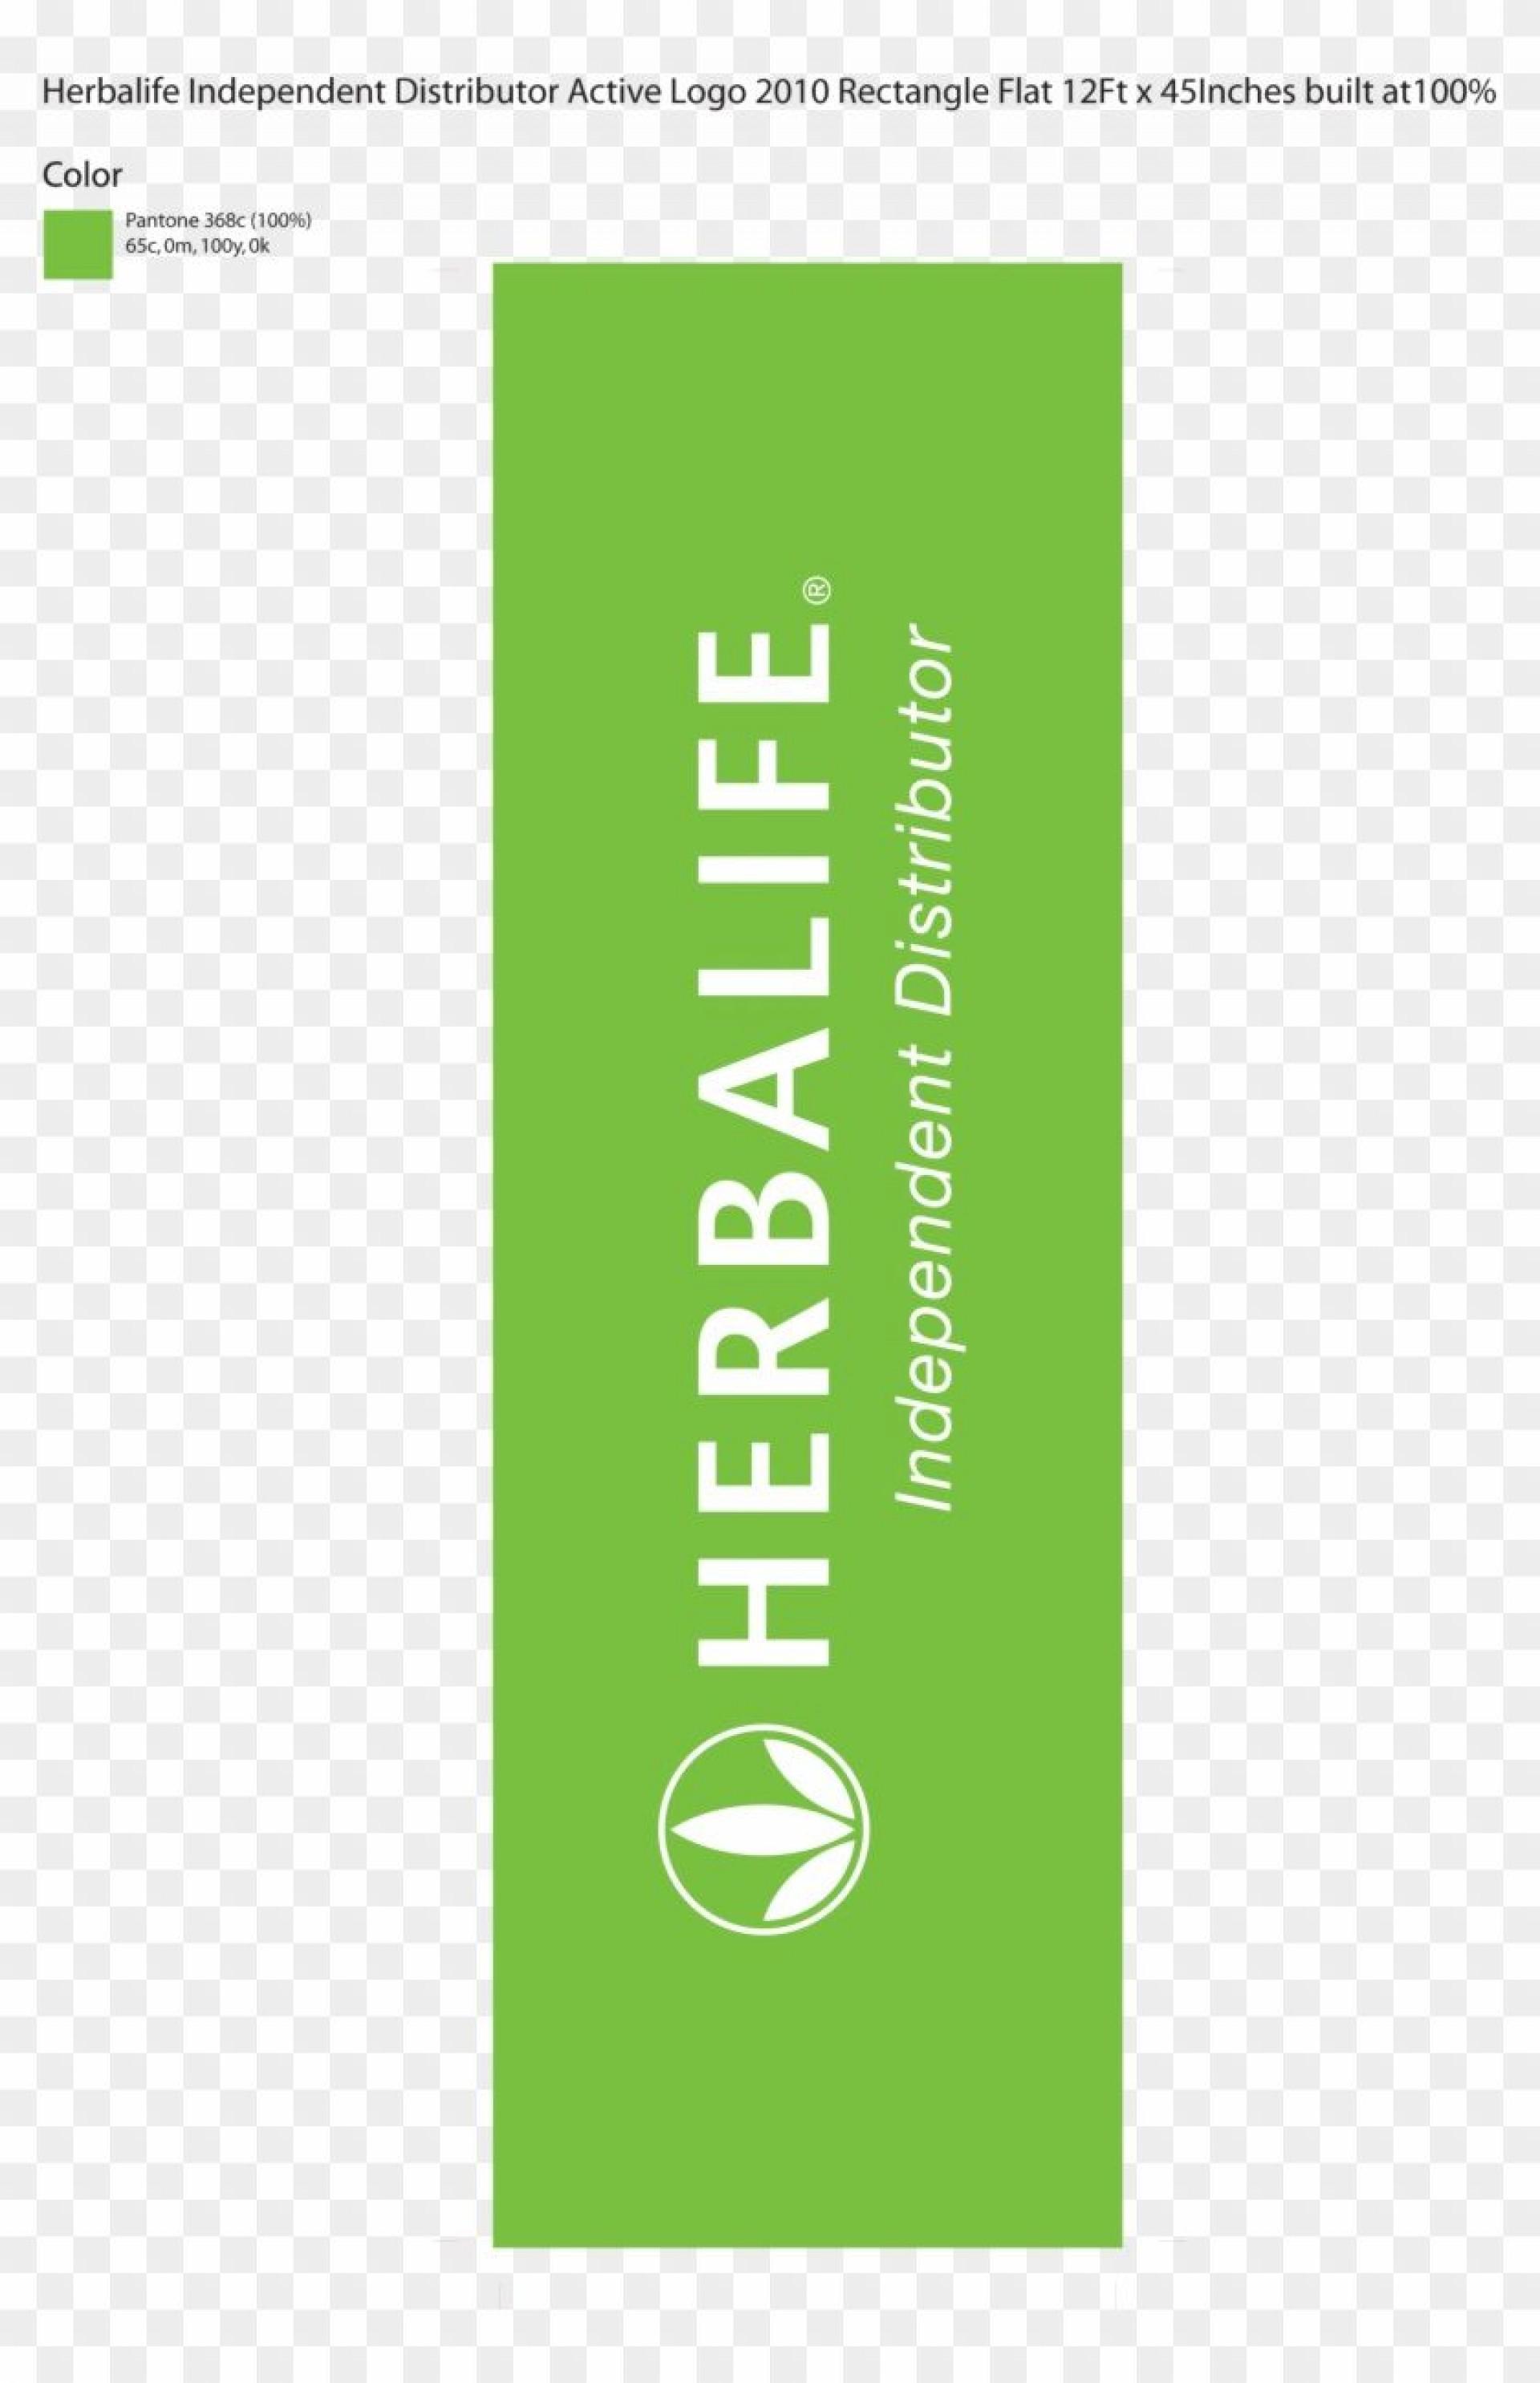 005 Singular Herbalife Busines Card Template Highest Quality  Download Free1920